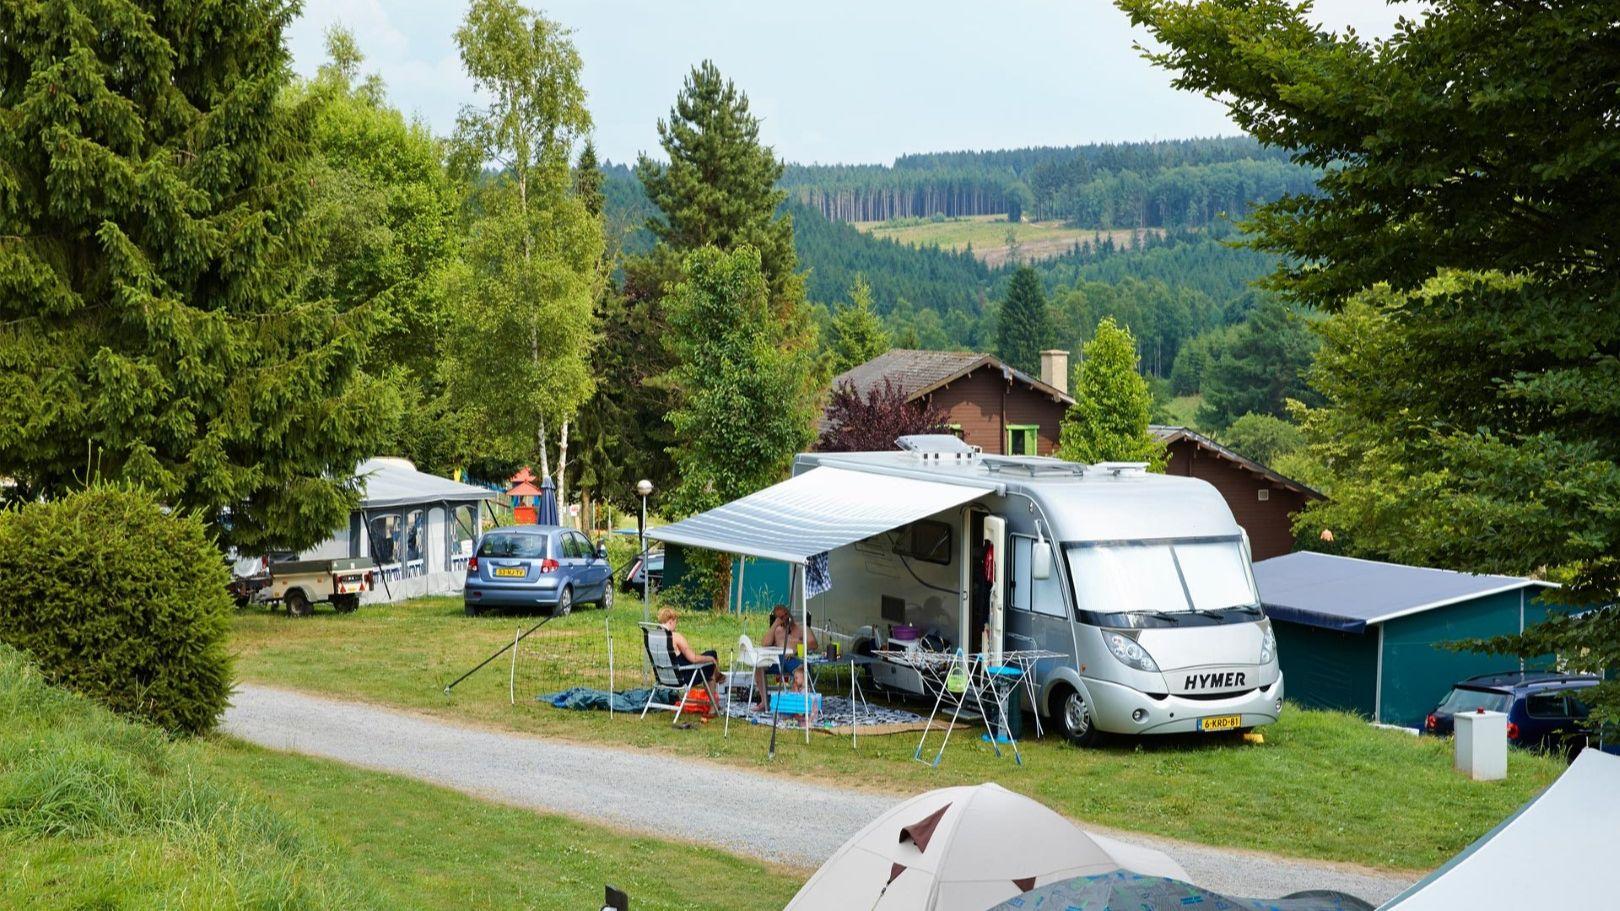 Mooiste panoramacamping in de Ardennen